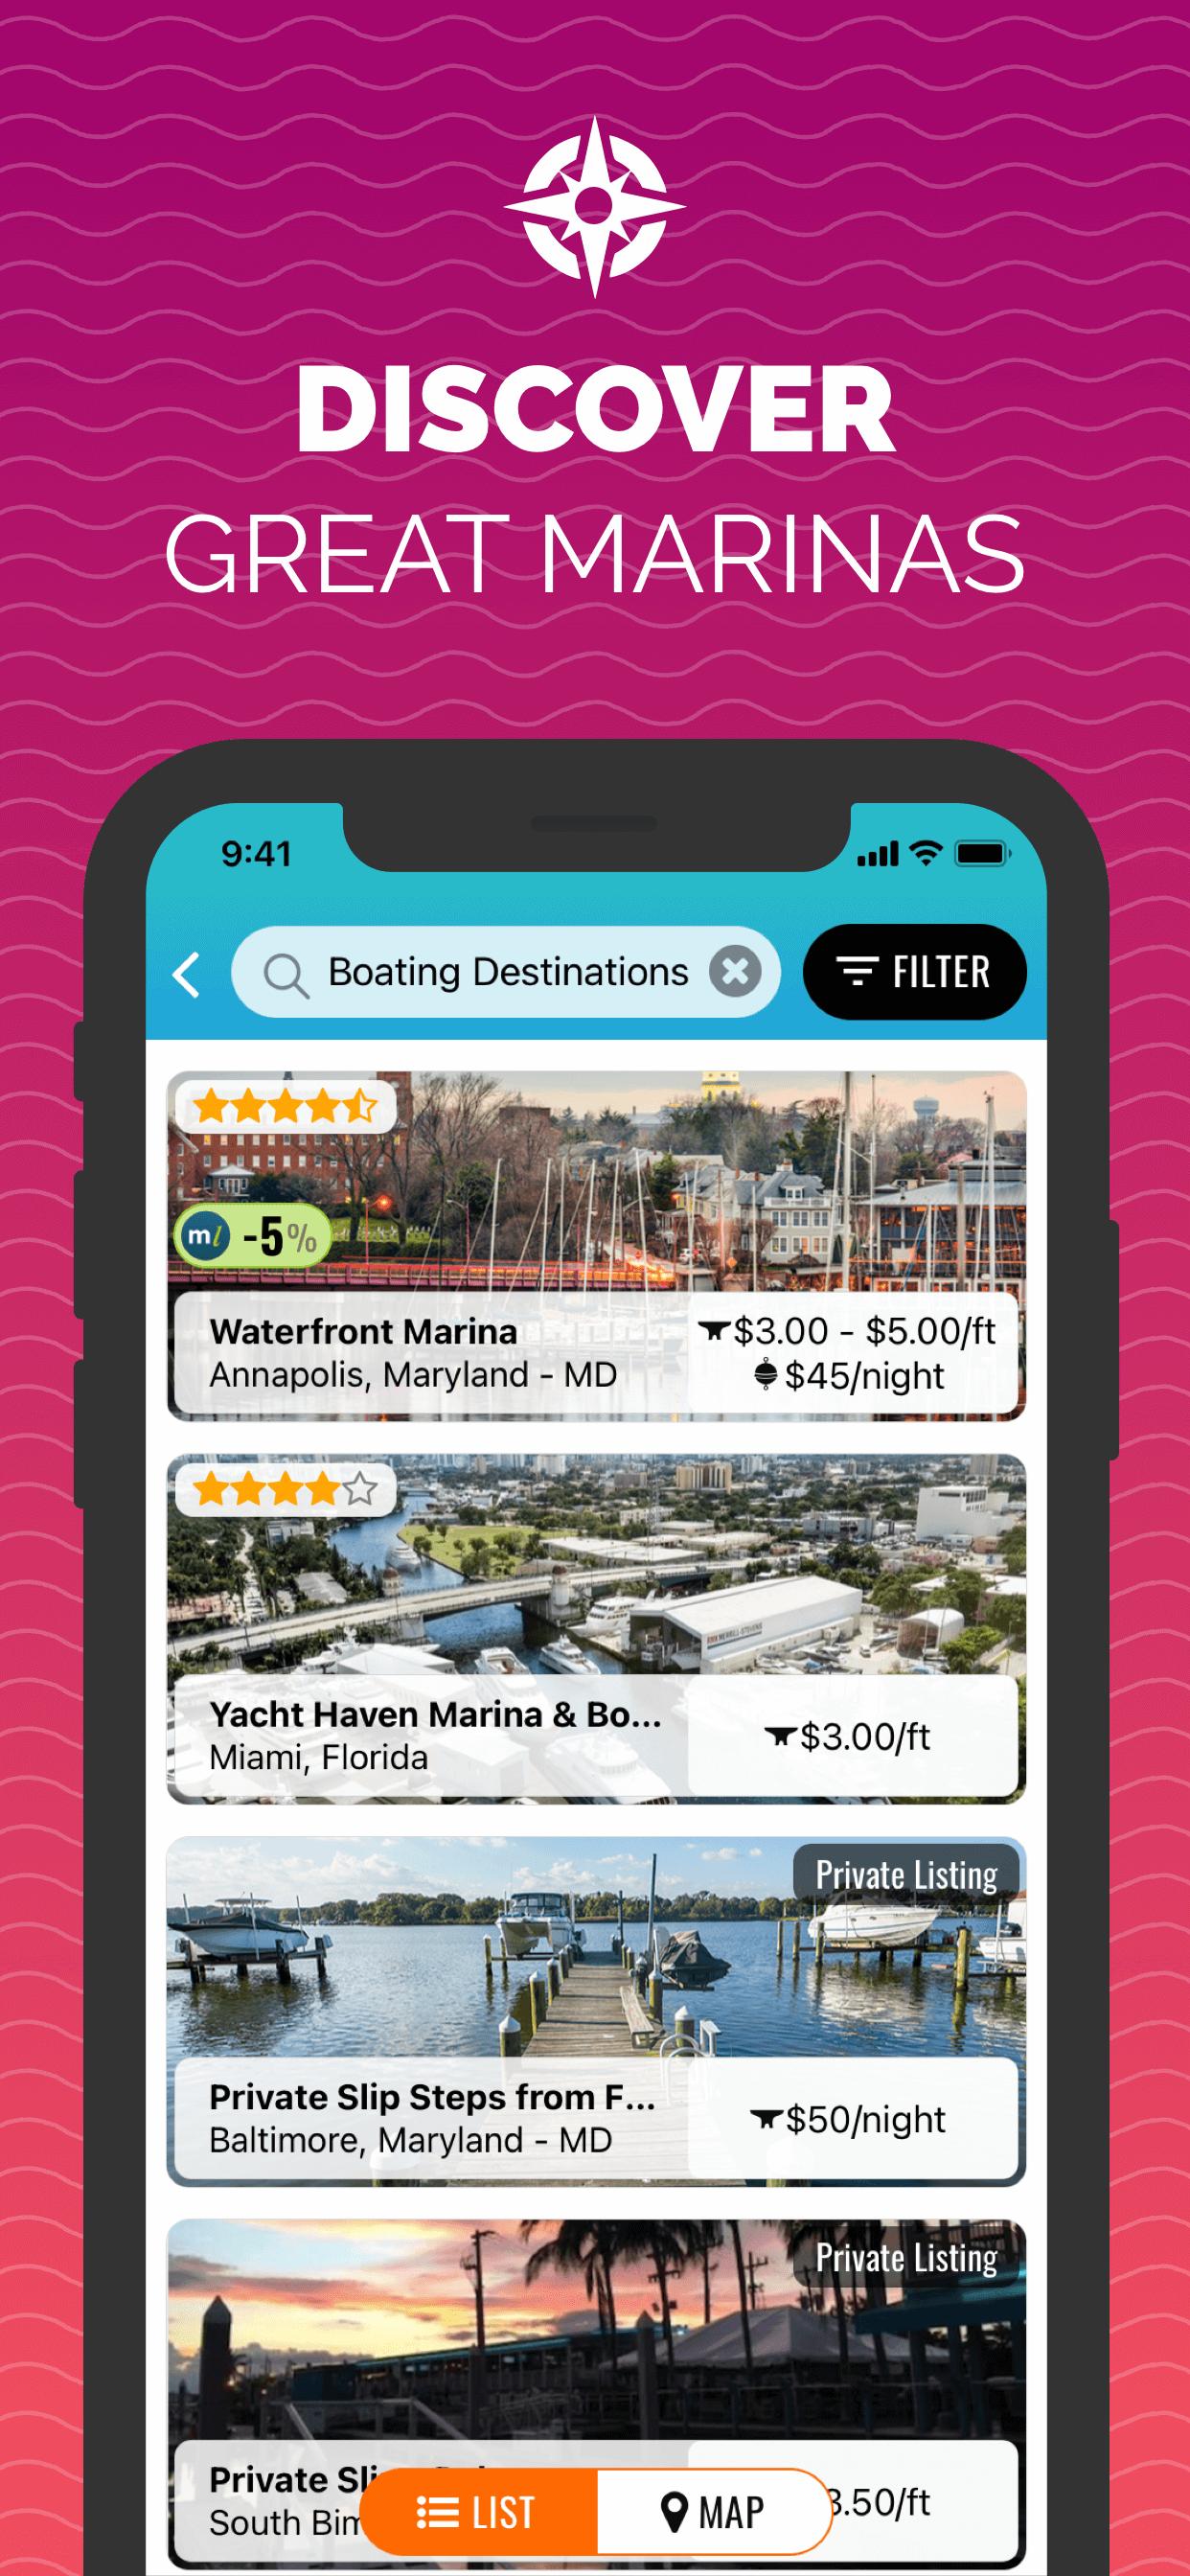 Marina Results - Snag-A-Slip 2.0 - Mobile App - Updates - Book Boat Slips